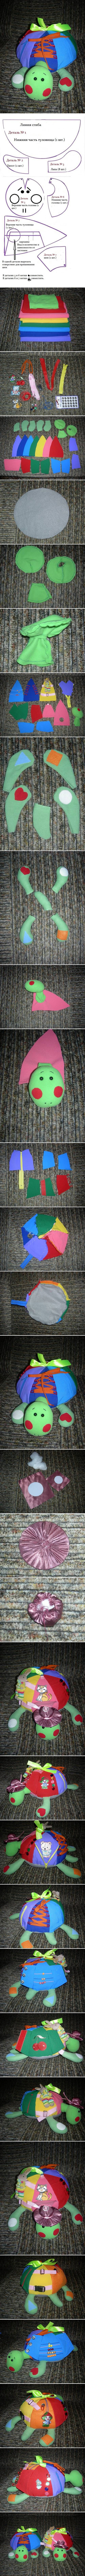 DIY Rainbow Turtle Toy DIY Rainbow Turtle Toy